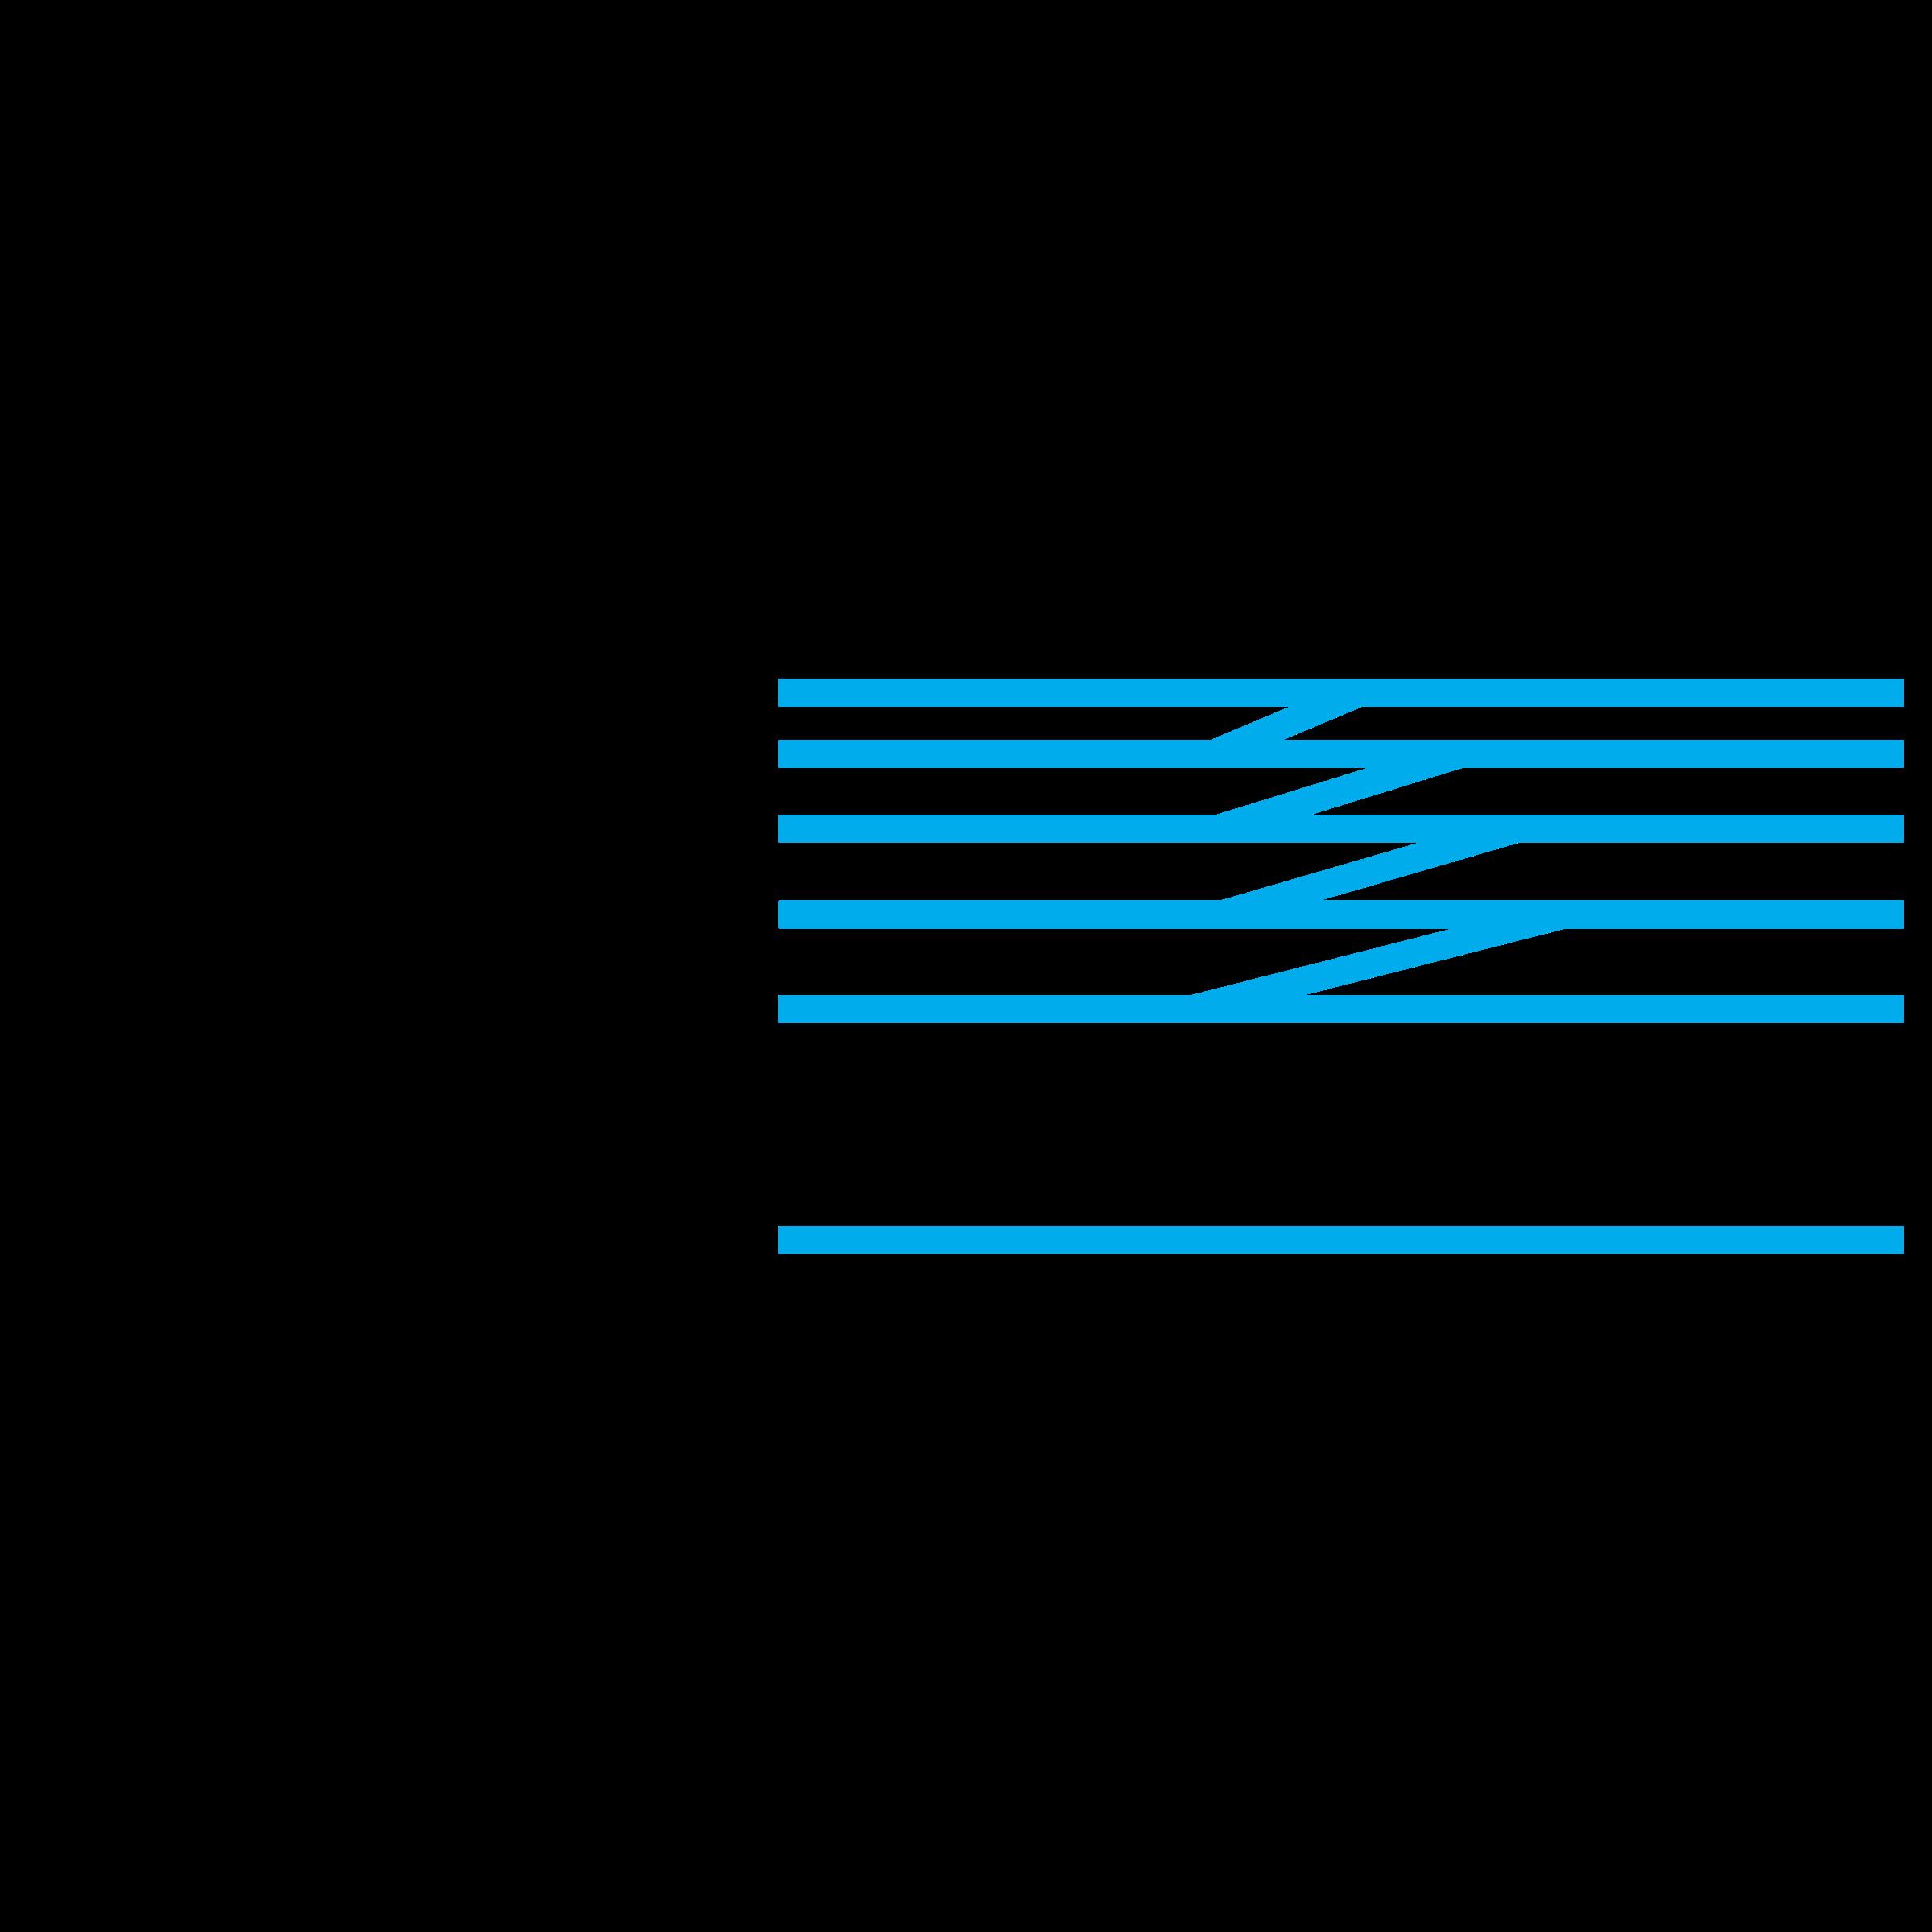 db-technologies-logo-png-transparent.png